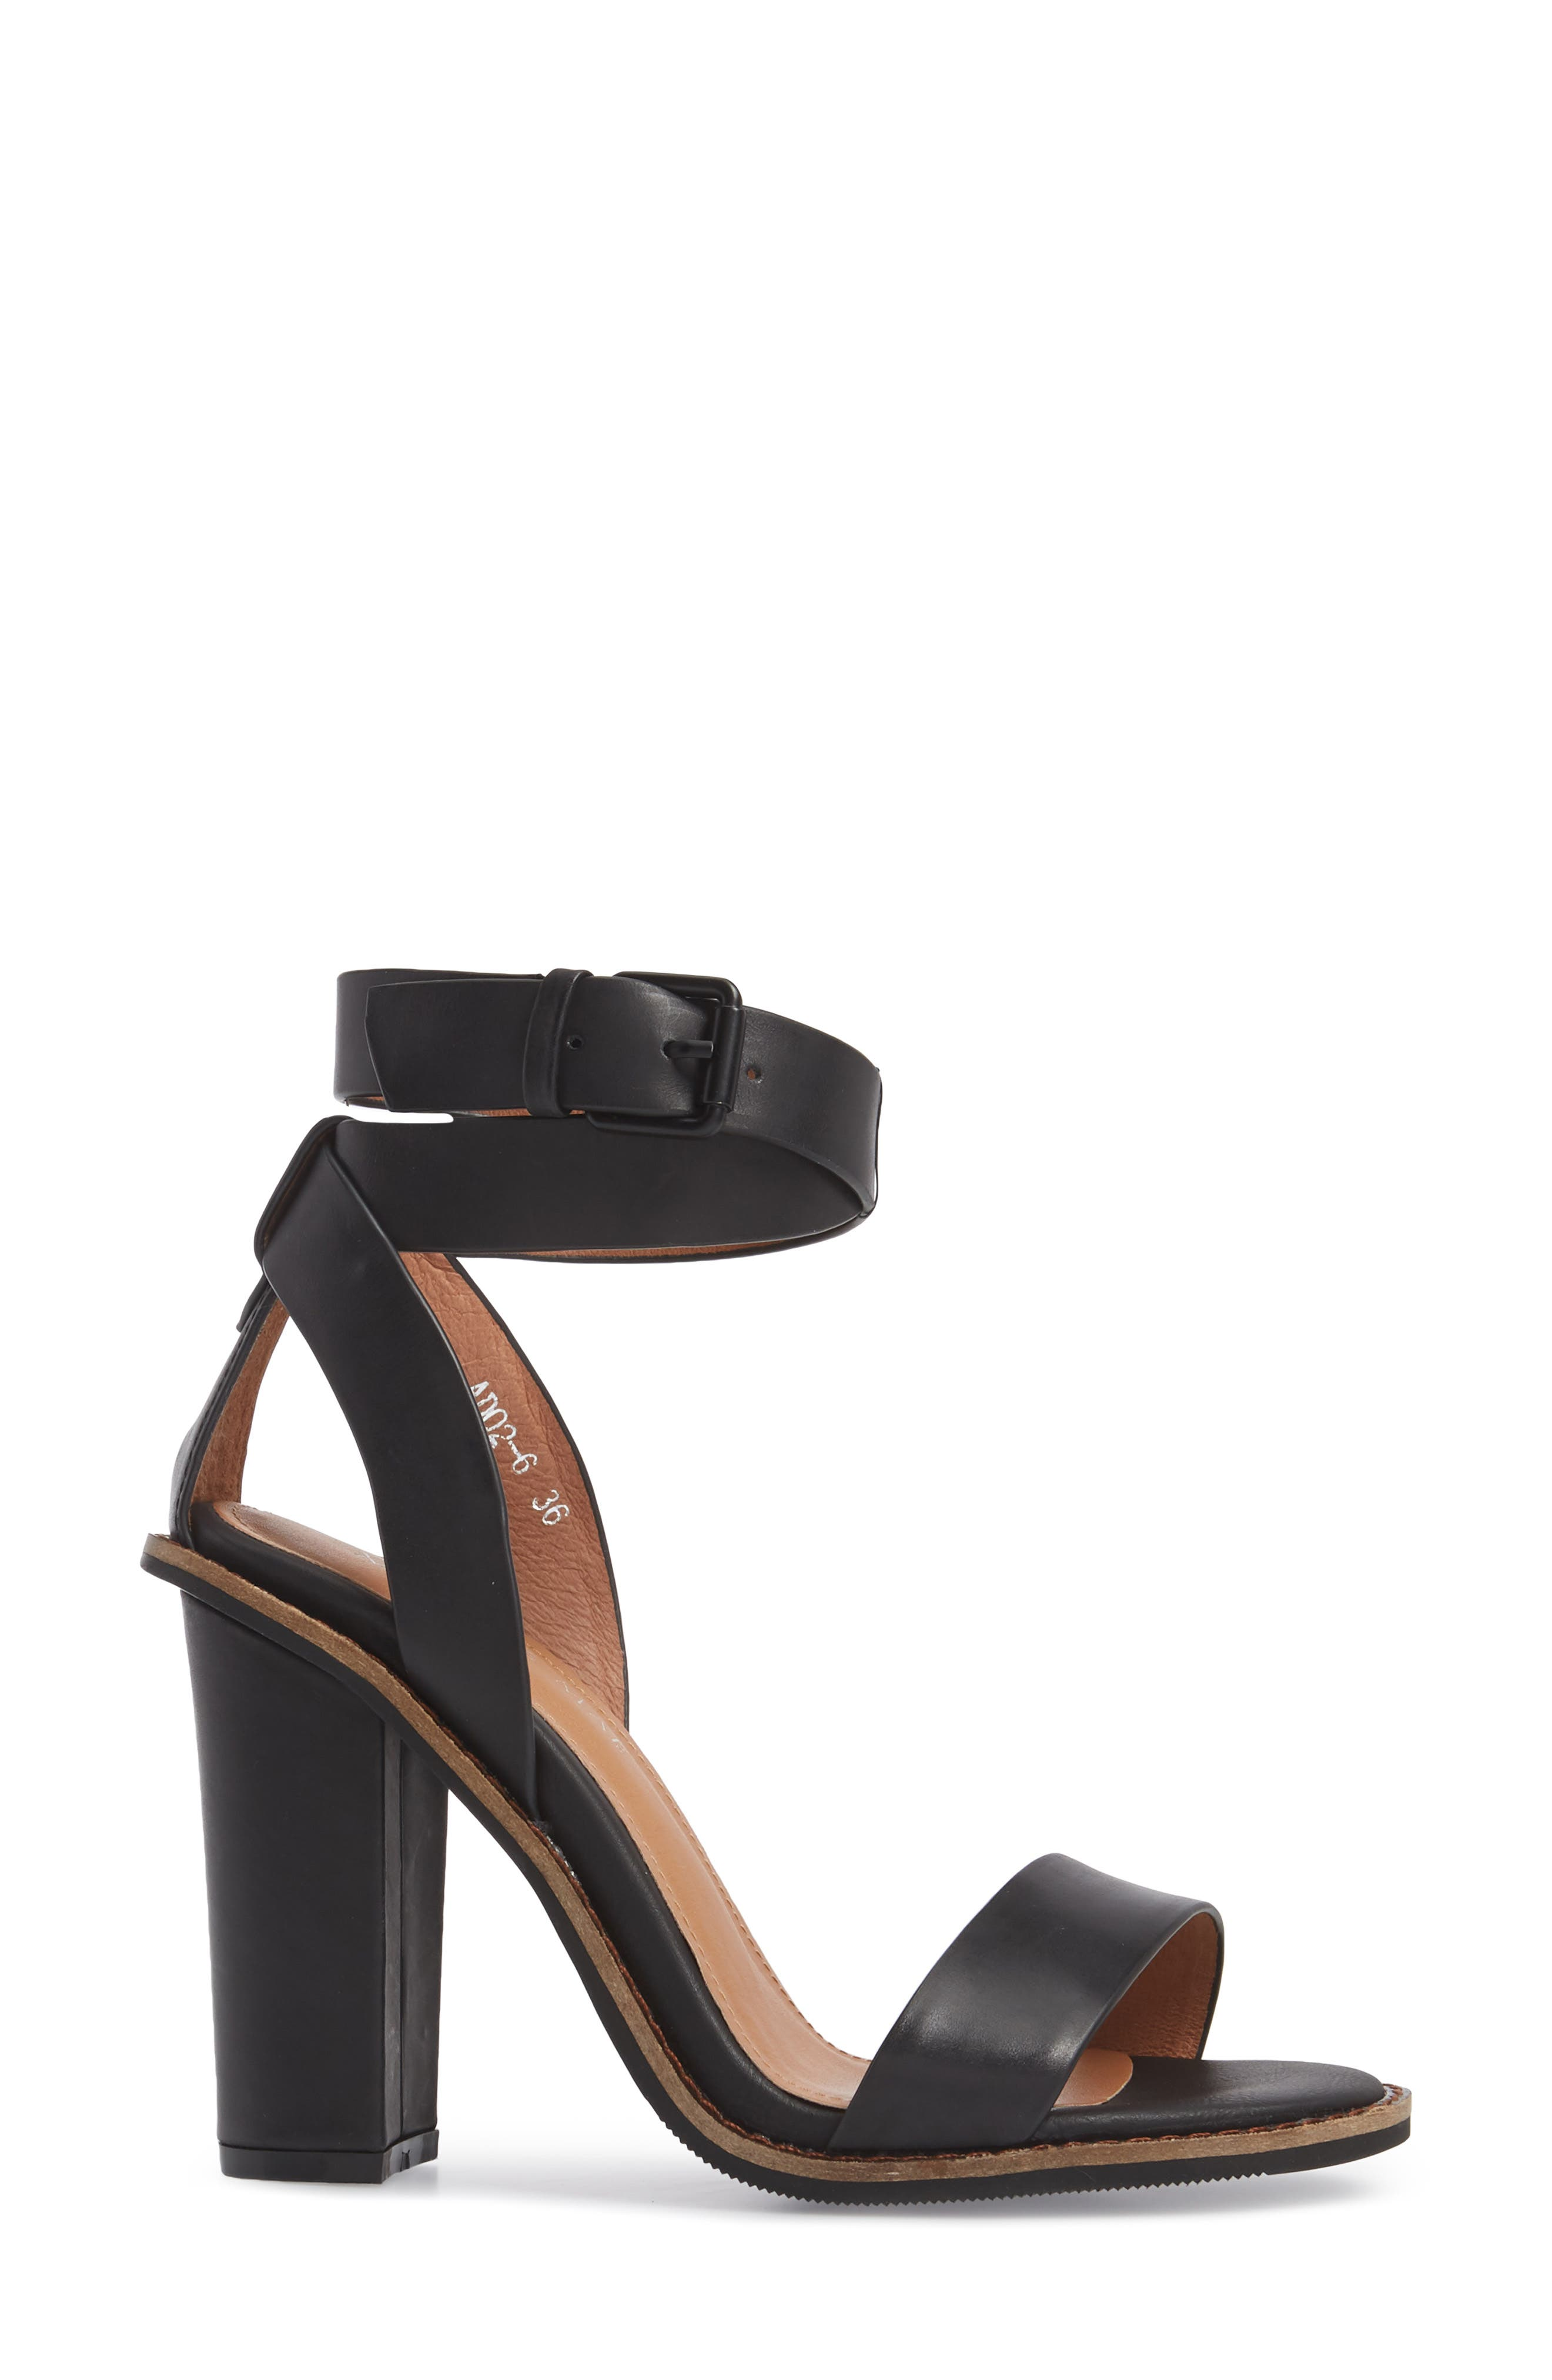 Calito Ankle Strap Sandal,                             Alternate thumbnail 3, color,                             001